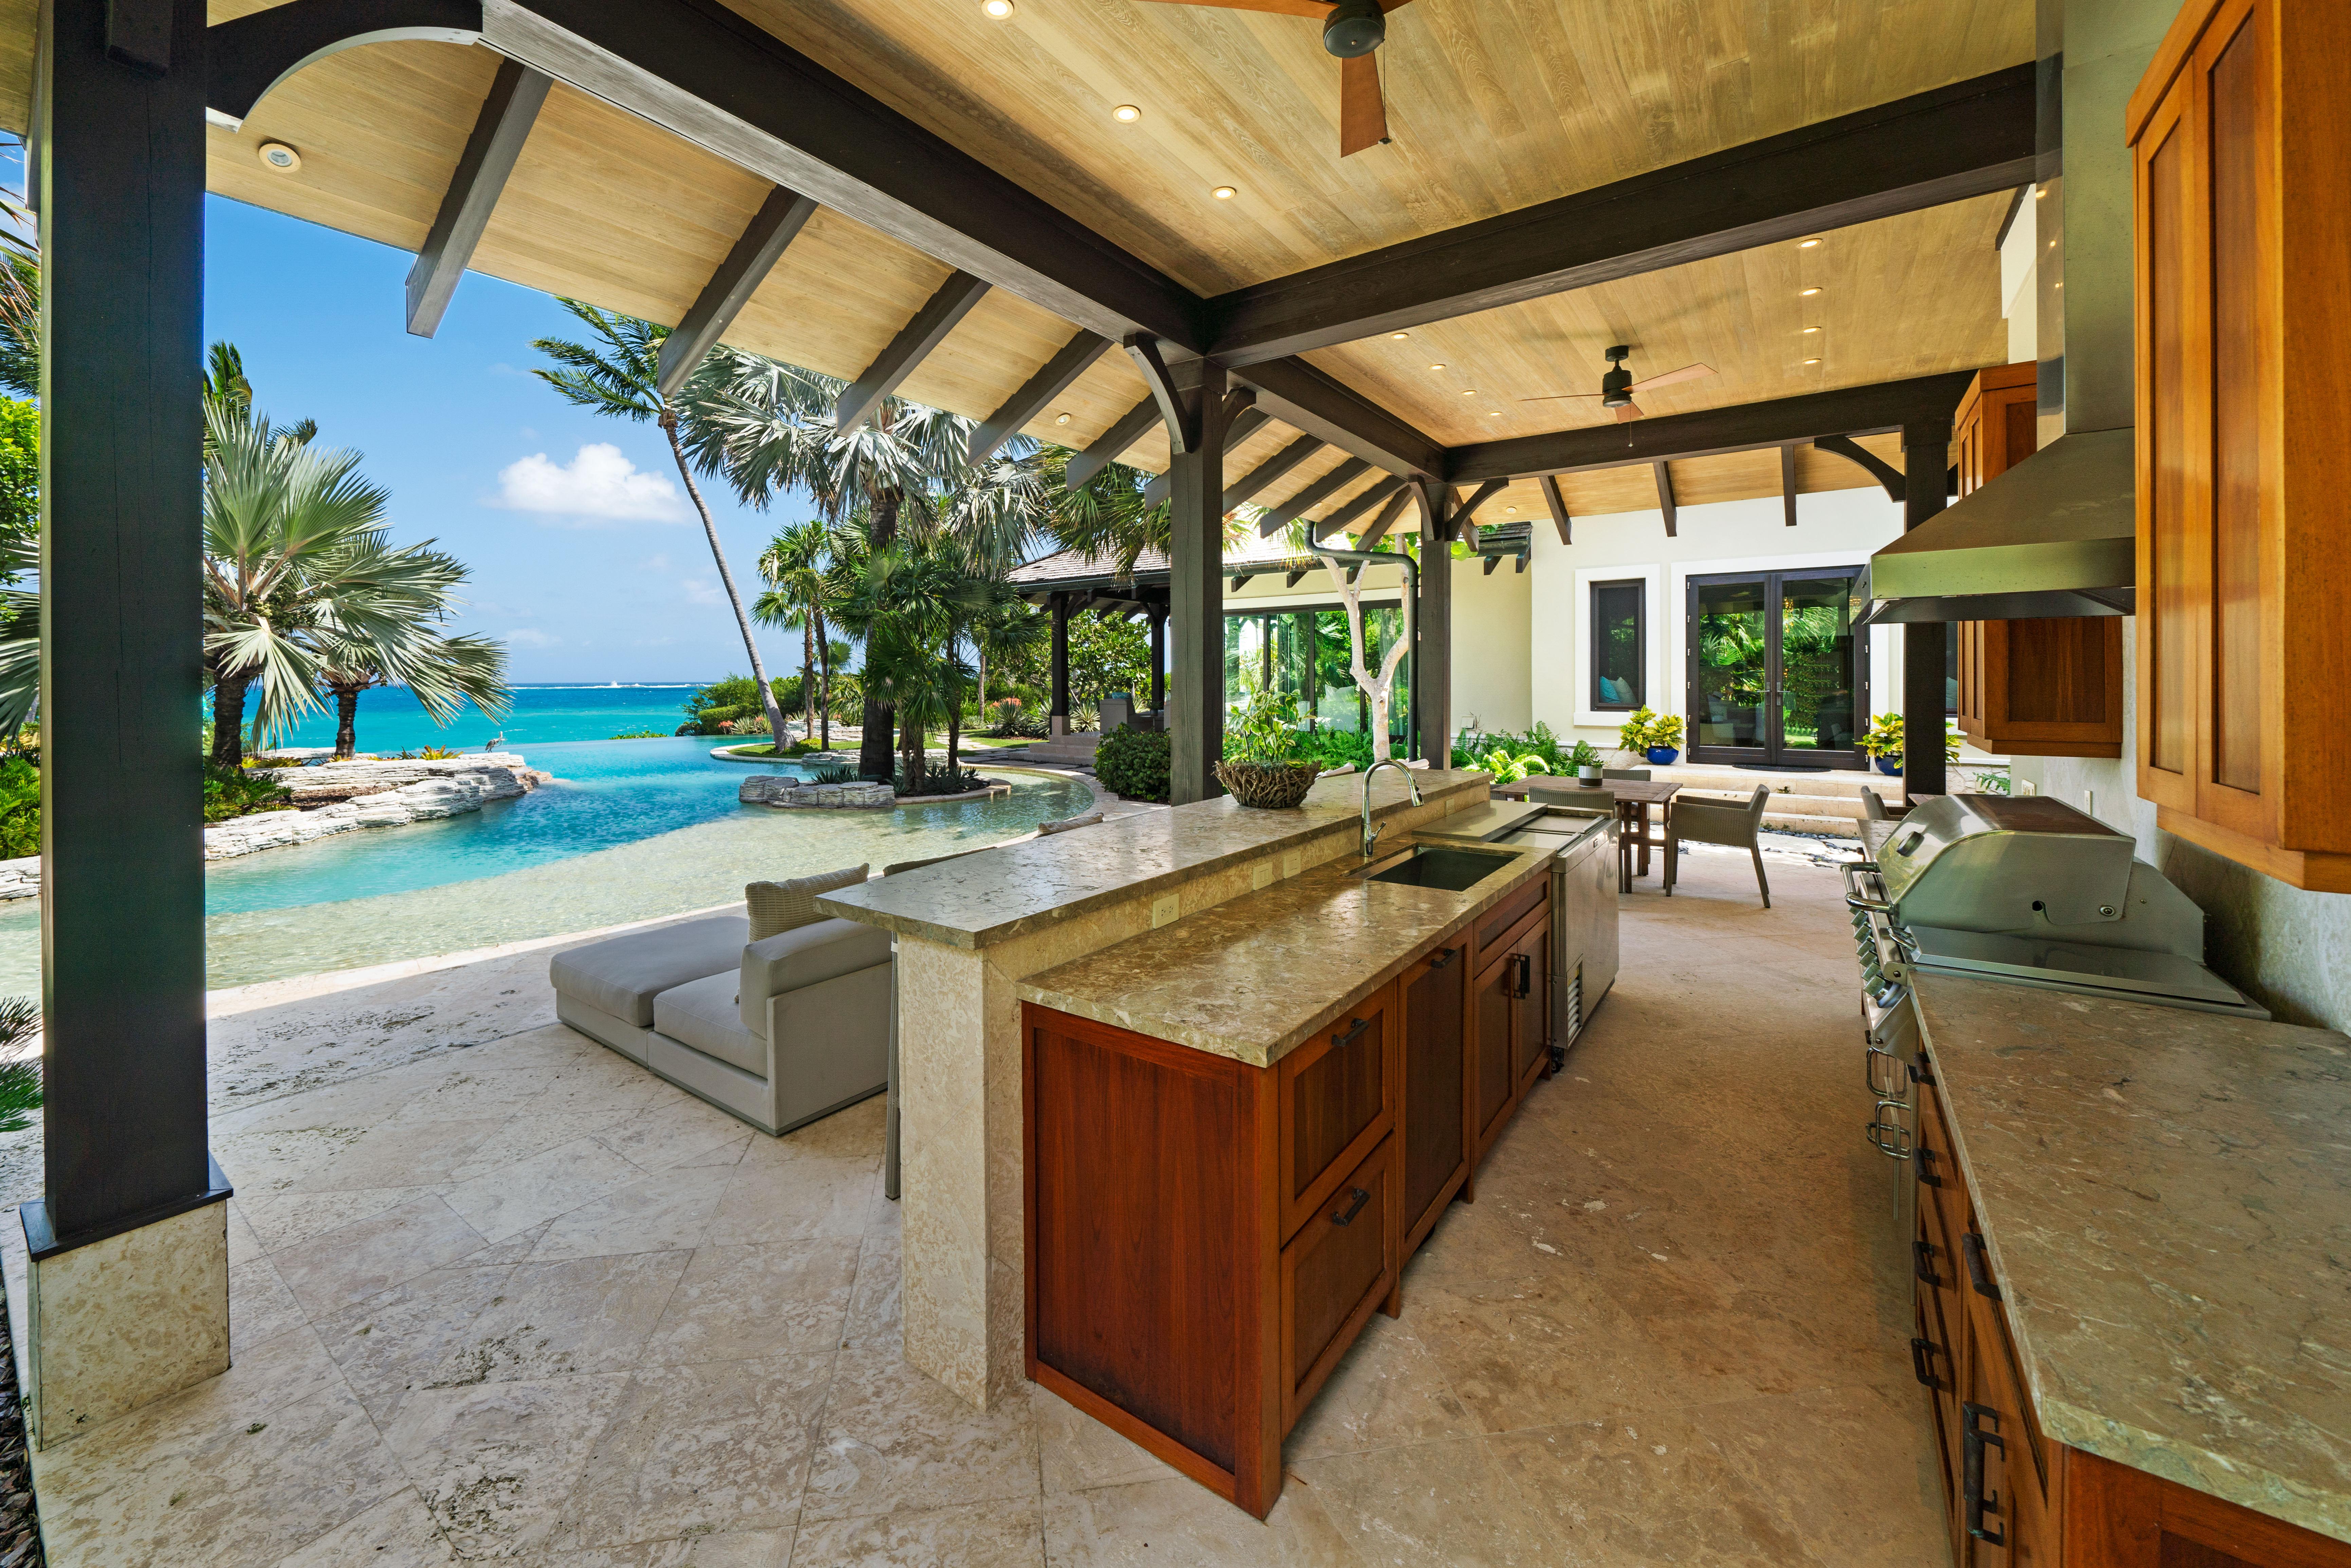 Large Outdoor Kitchen Area